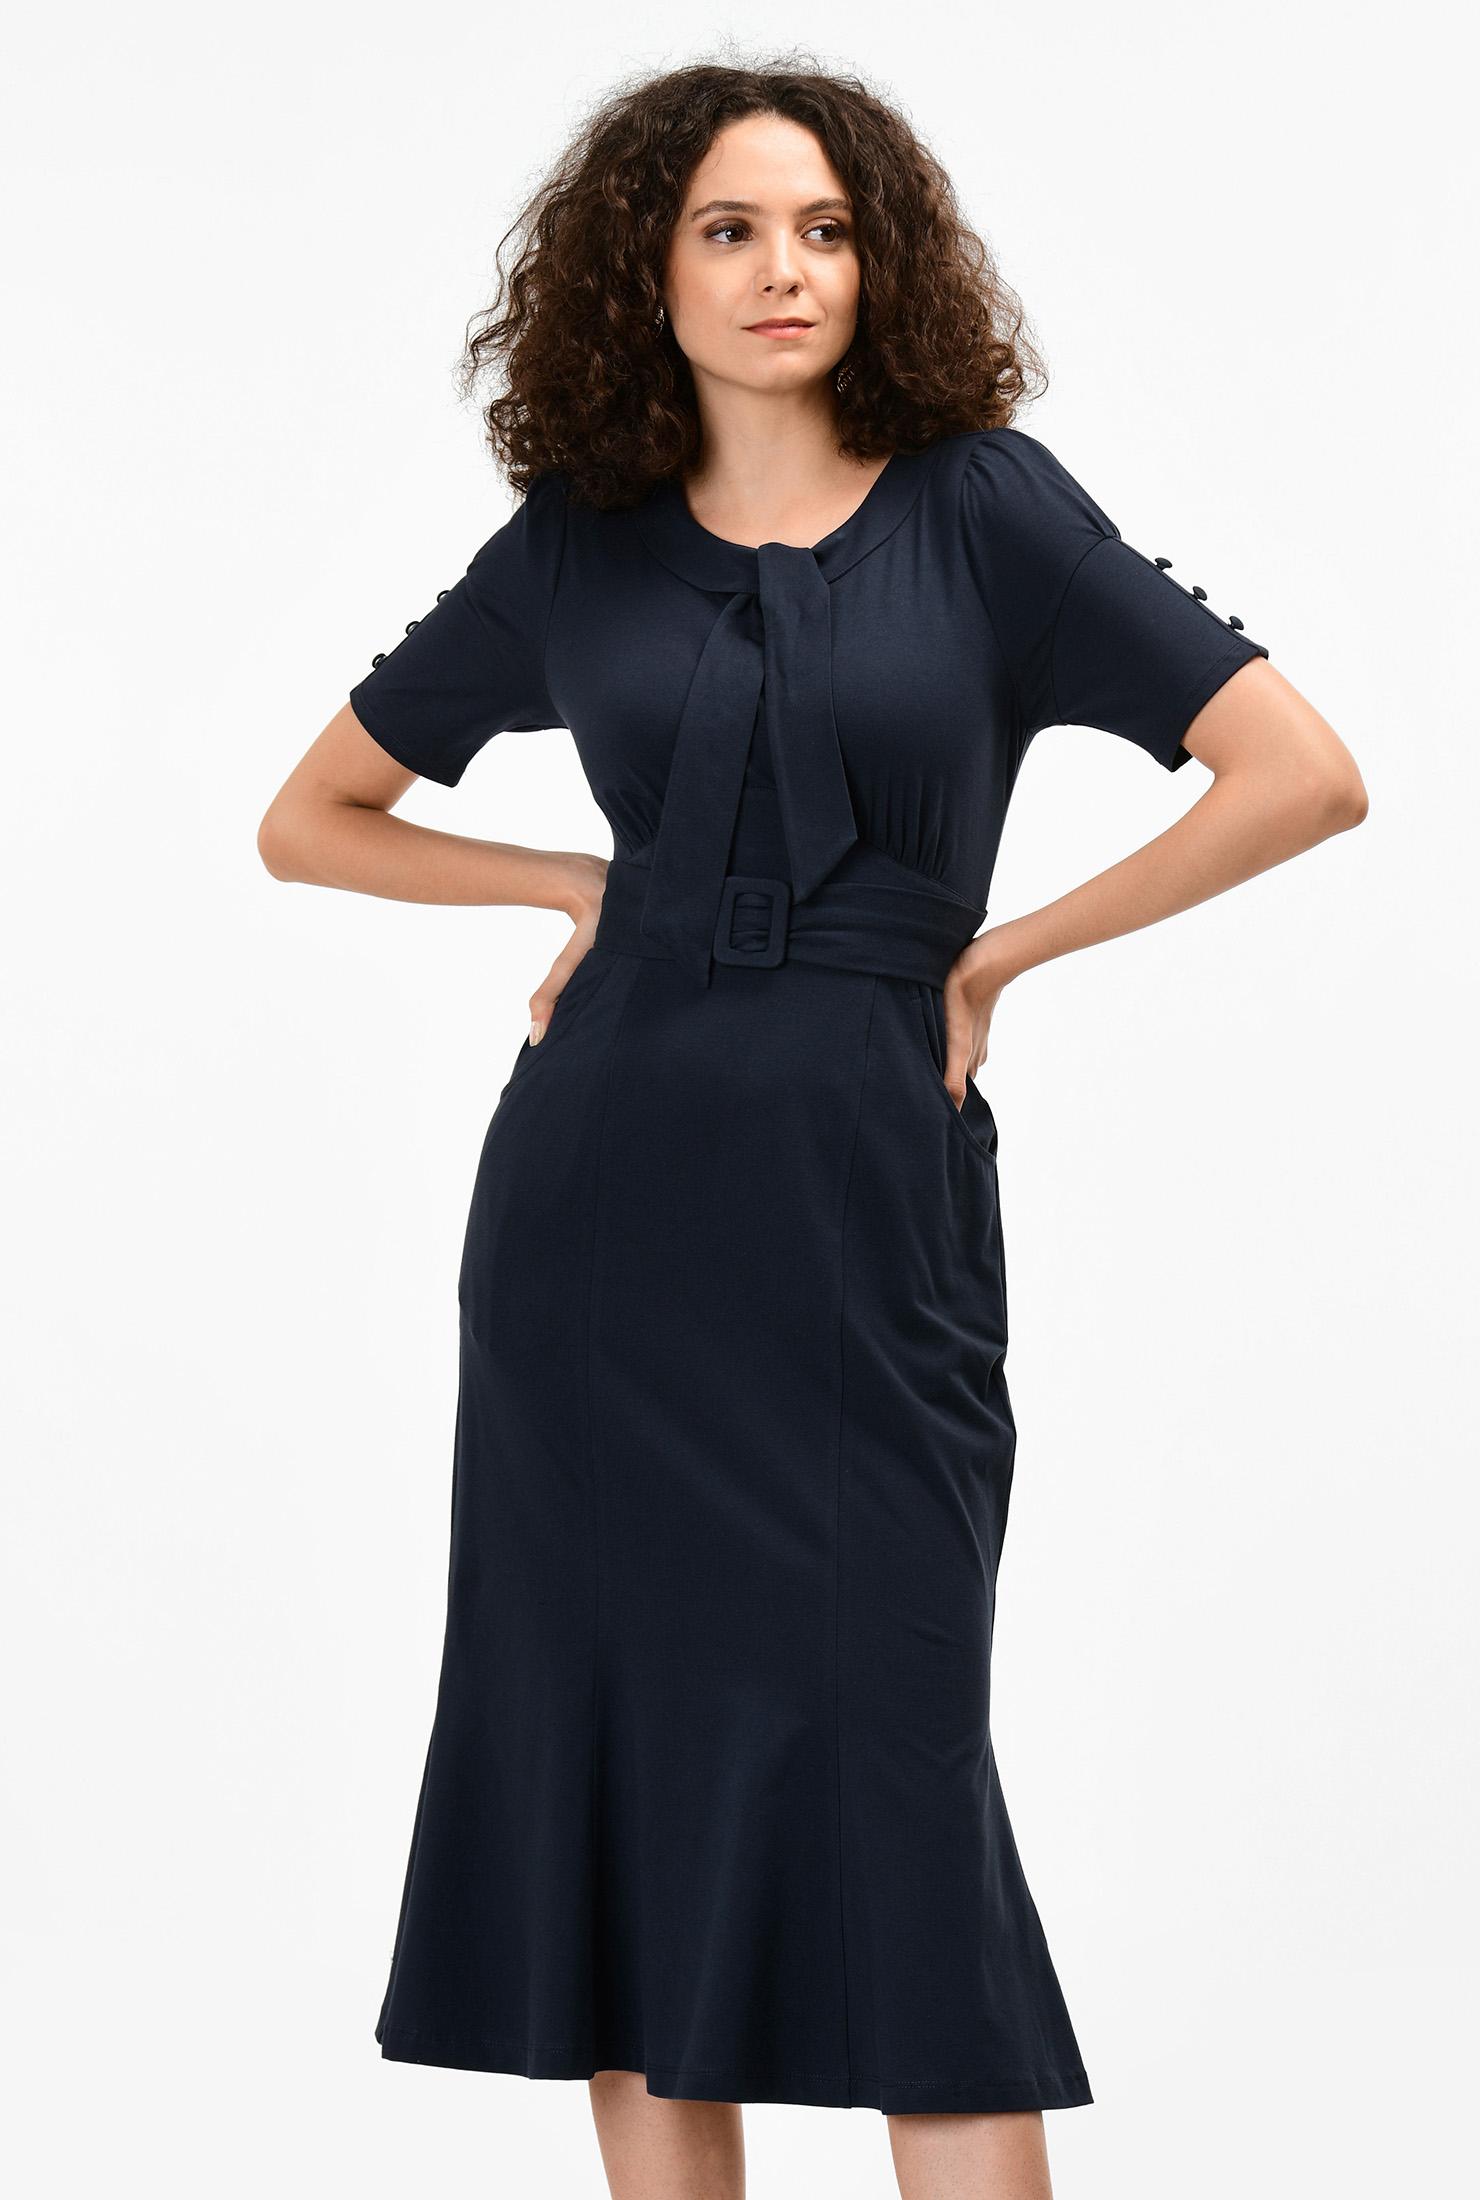 1930s Day Dresses, Tea Dresses, House Dresses Flounce hem cotton knit sheath dress $59.95 AT vintagedancer.com